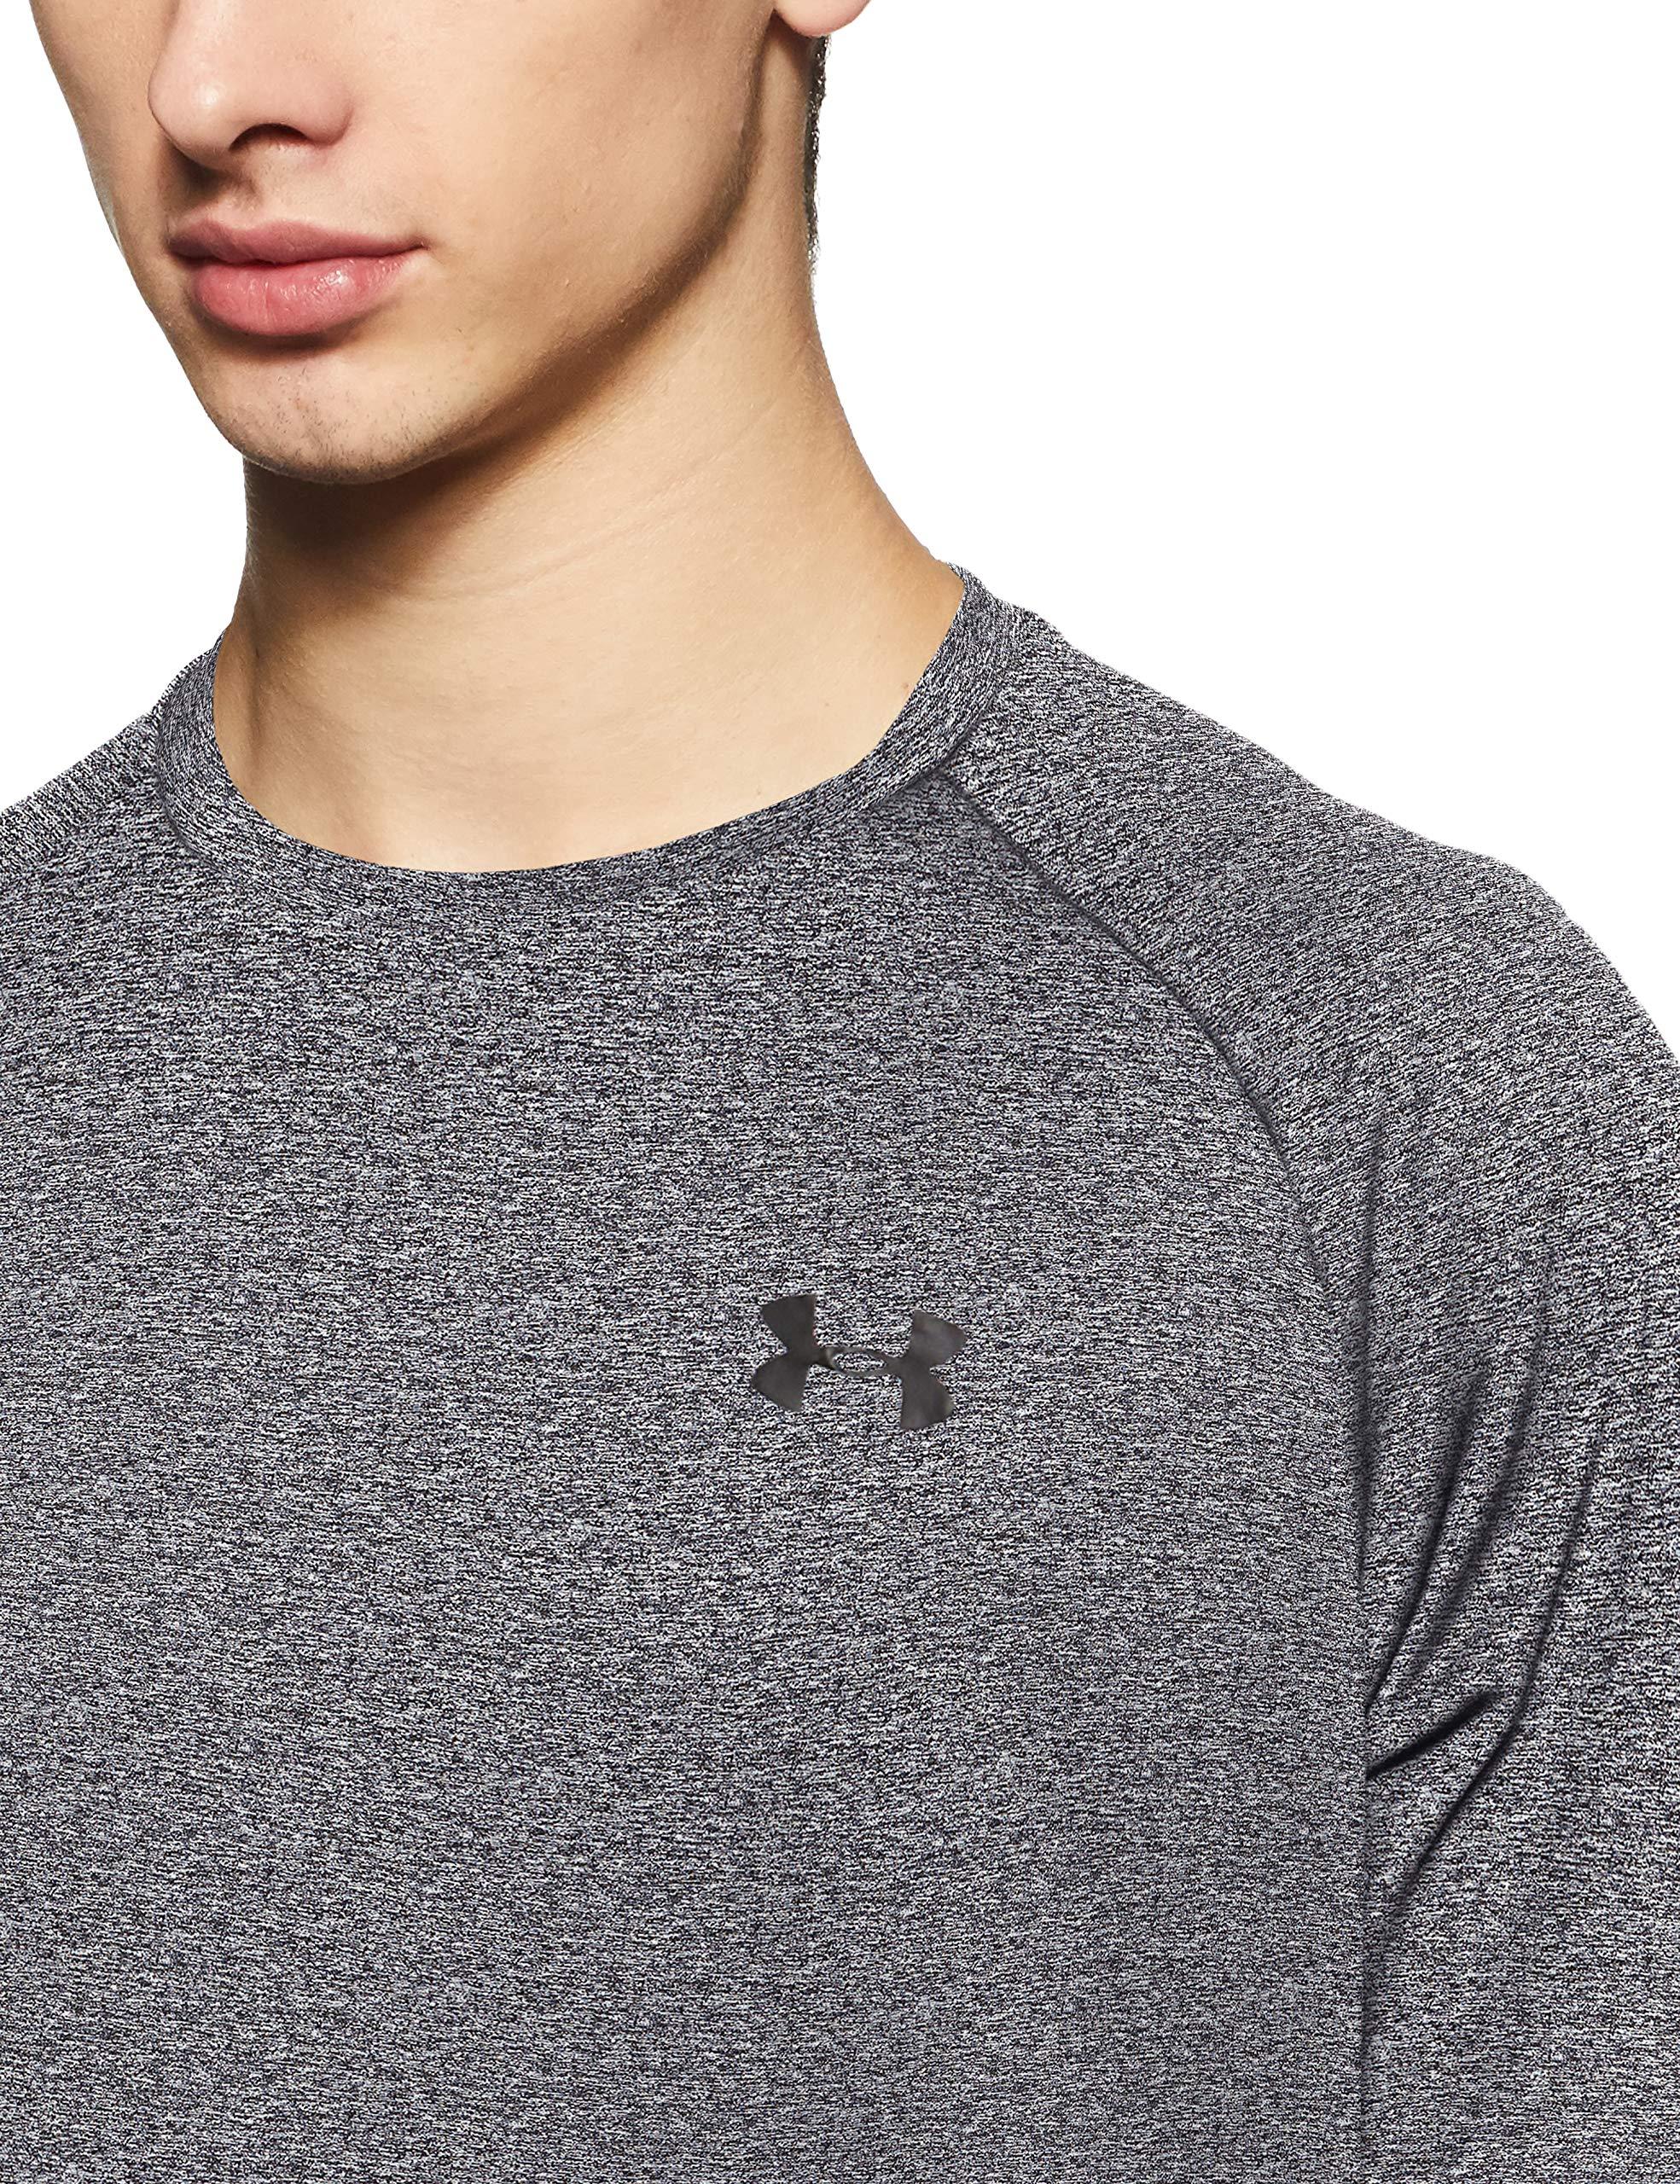 Under Armour Men's Tech 2.0 Short Sleeve T-Shirt, Black (002)/Black, 3X-Large by Under Armour (Image #4)